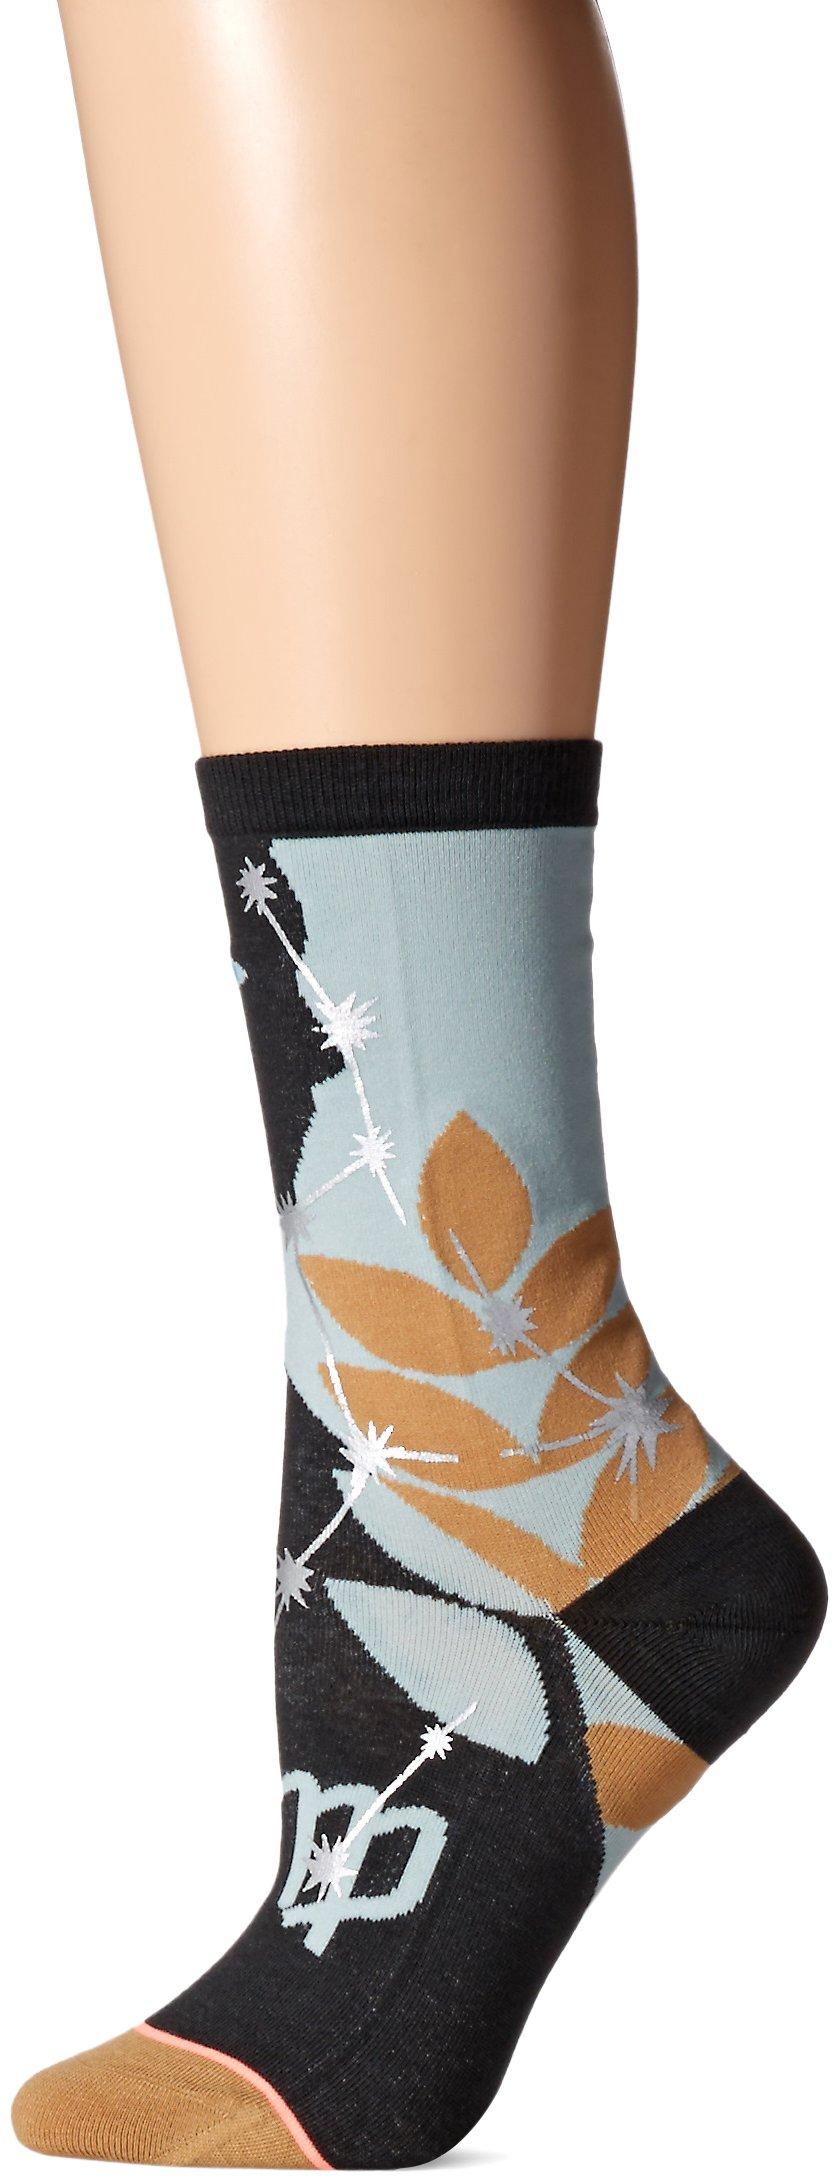 Stance Women's Virgo Zodiak Crew Sock, Multi, Small by Stance (Image #1)